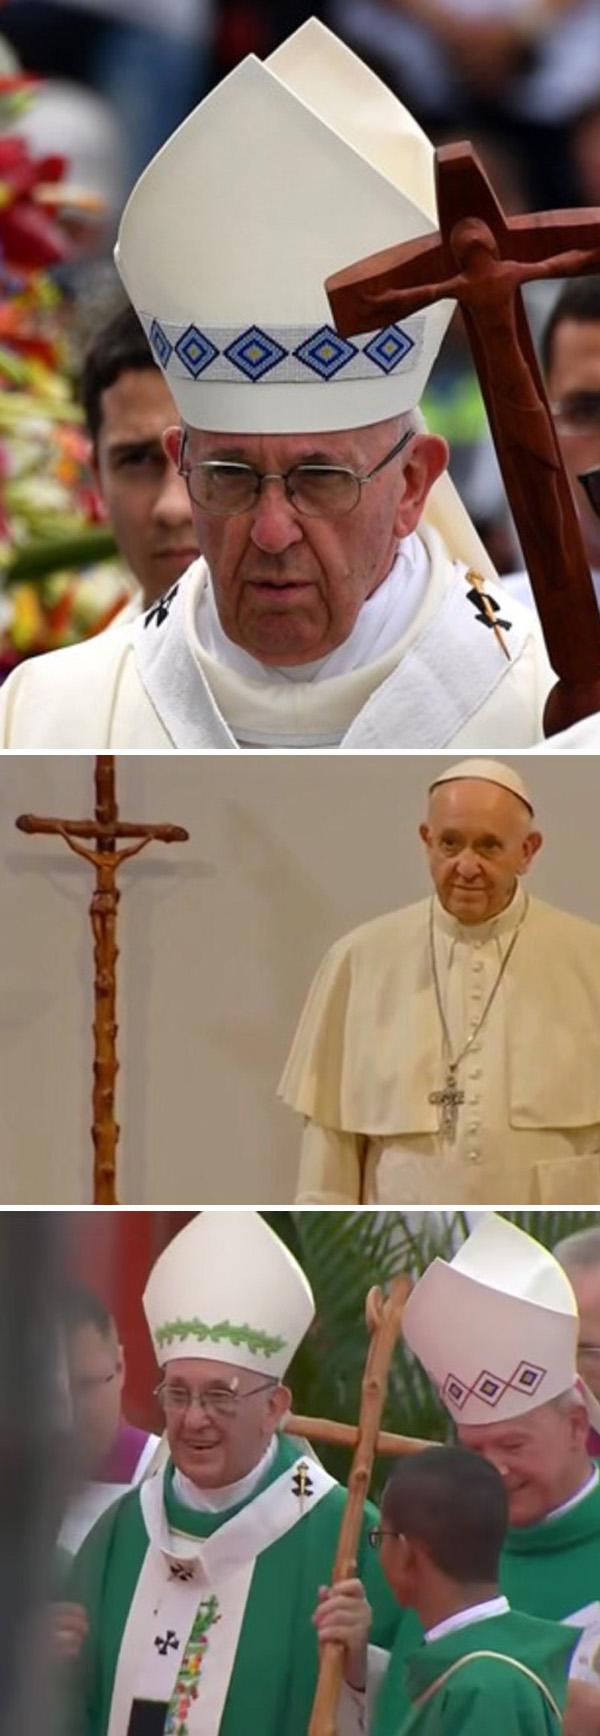 Pauperist papal crossier 2